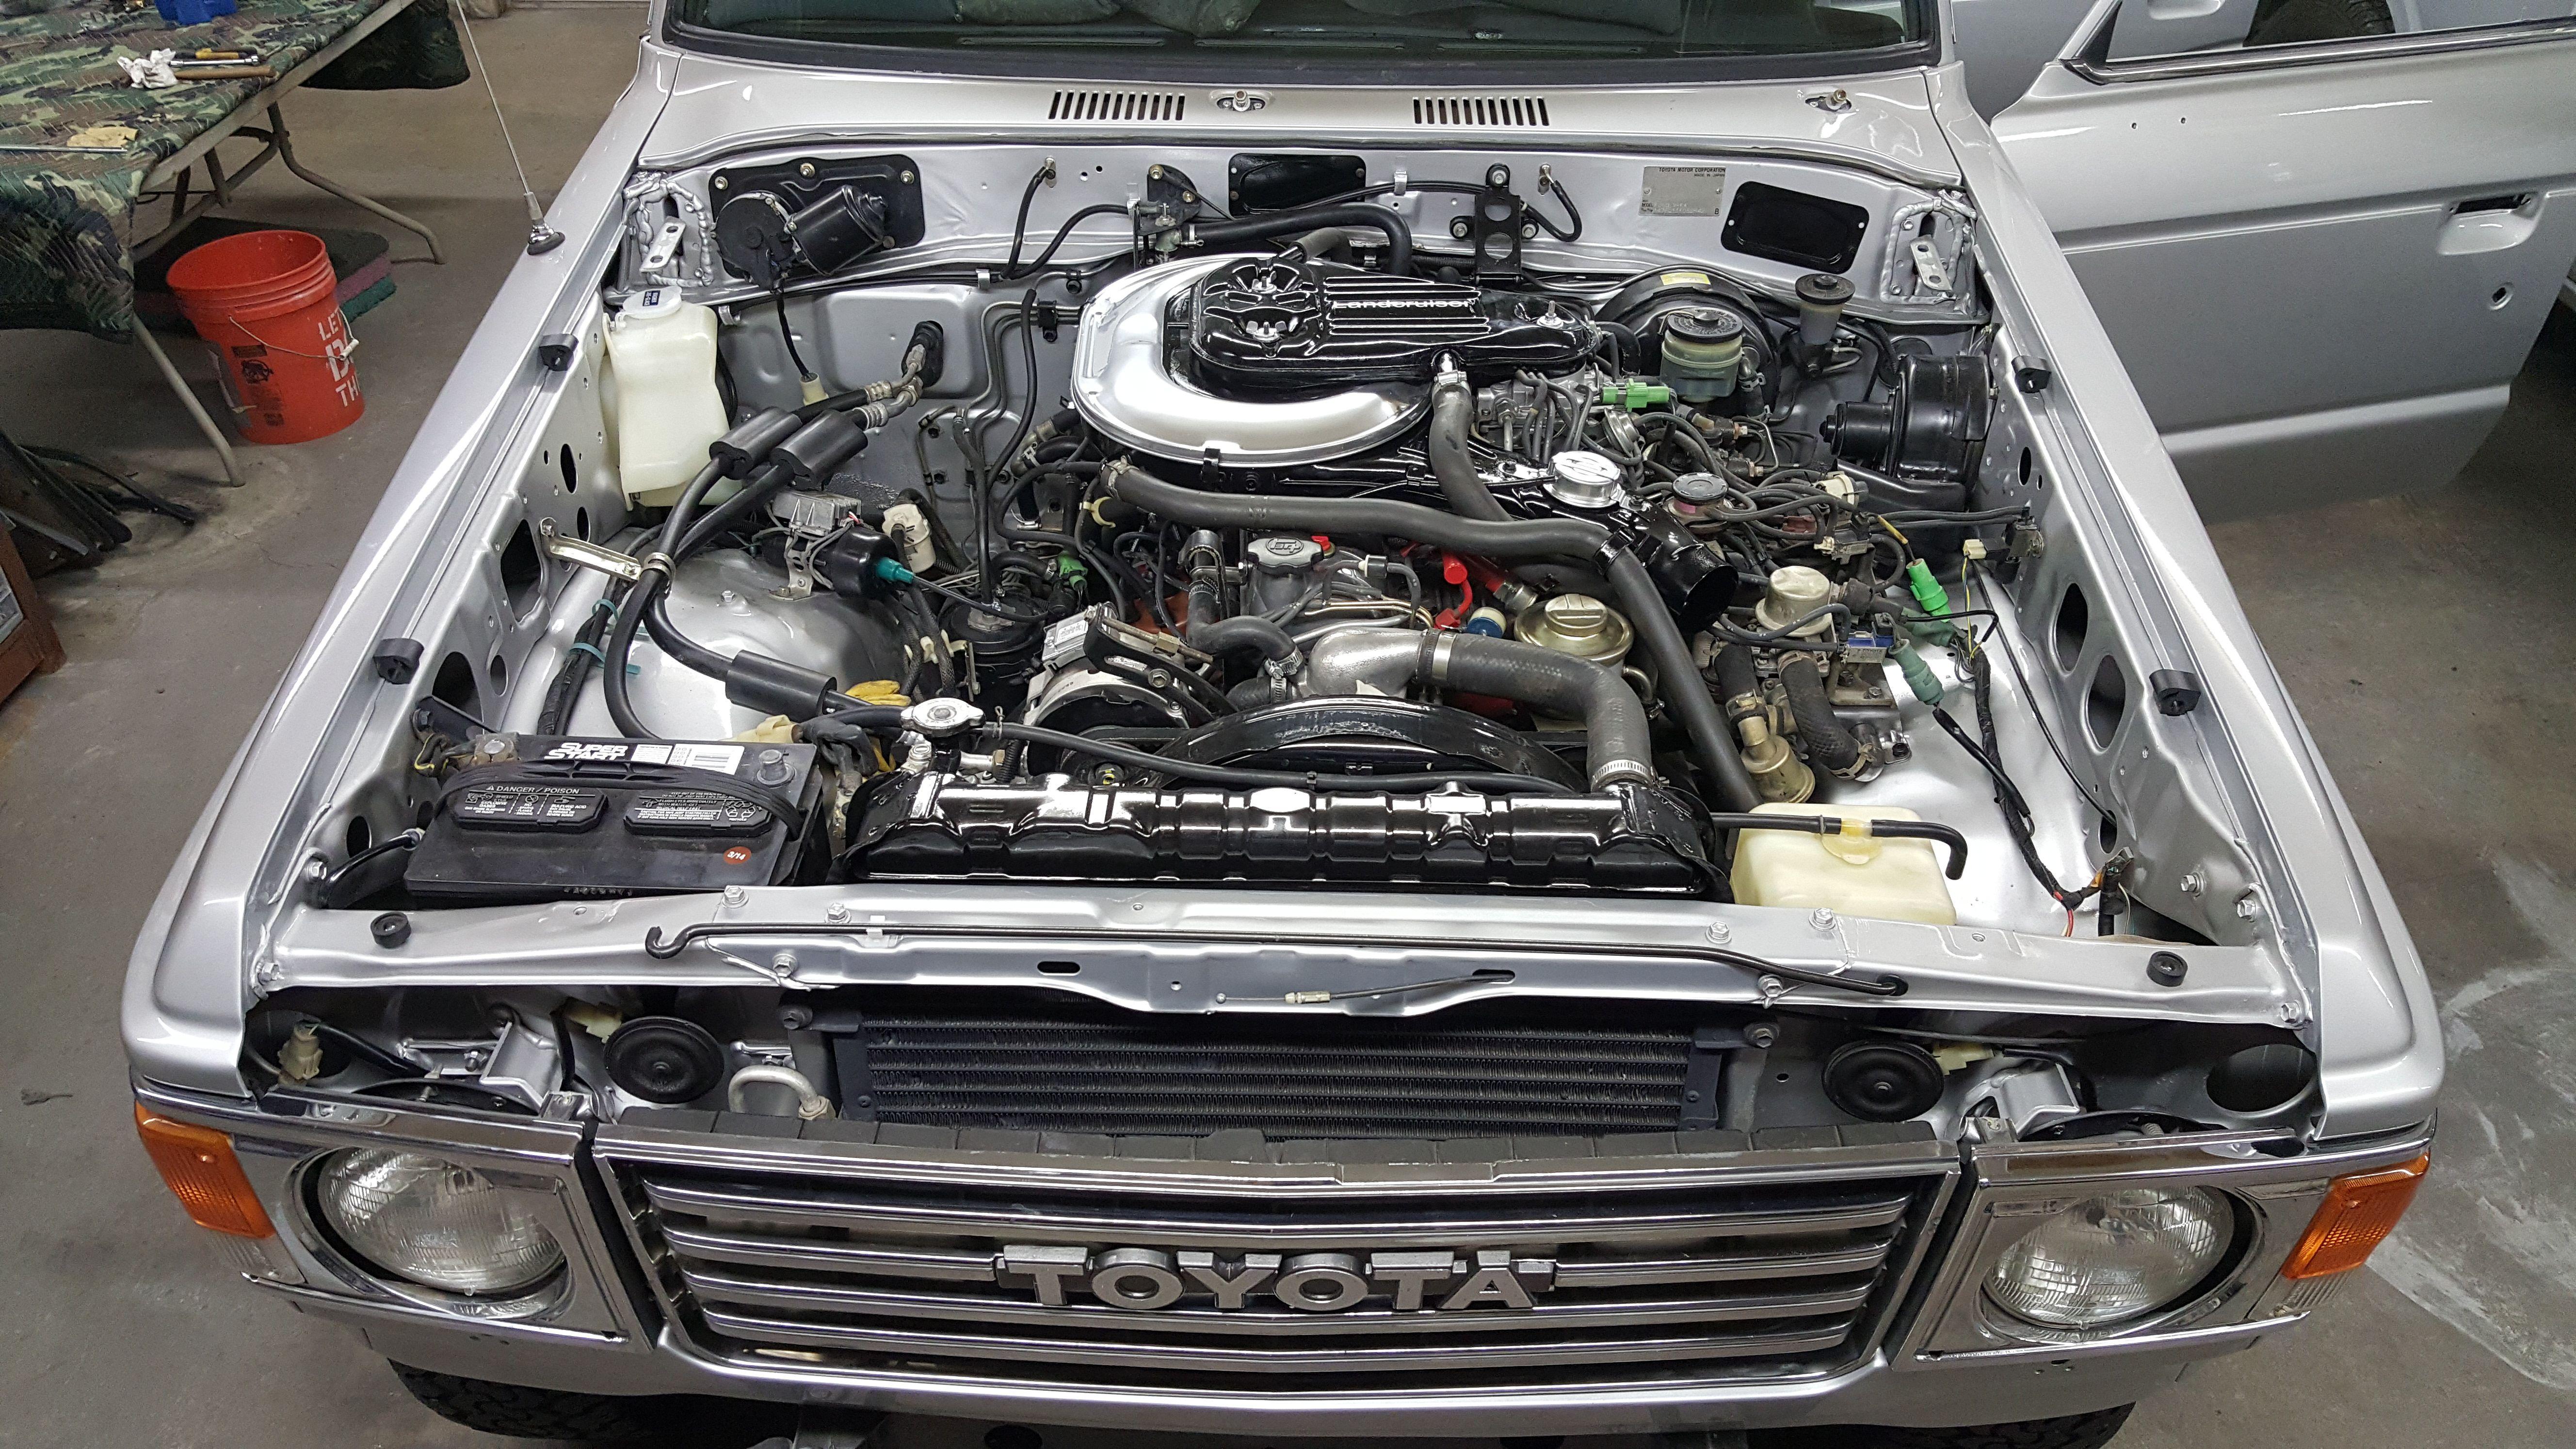 「Toyota」おしゃれまとめの人気アイデア Pinterest Britain Allenbaugh ランクル60